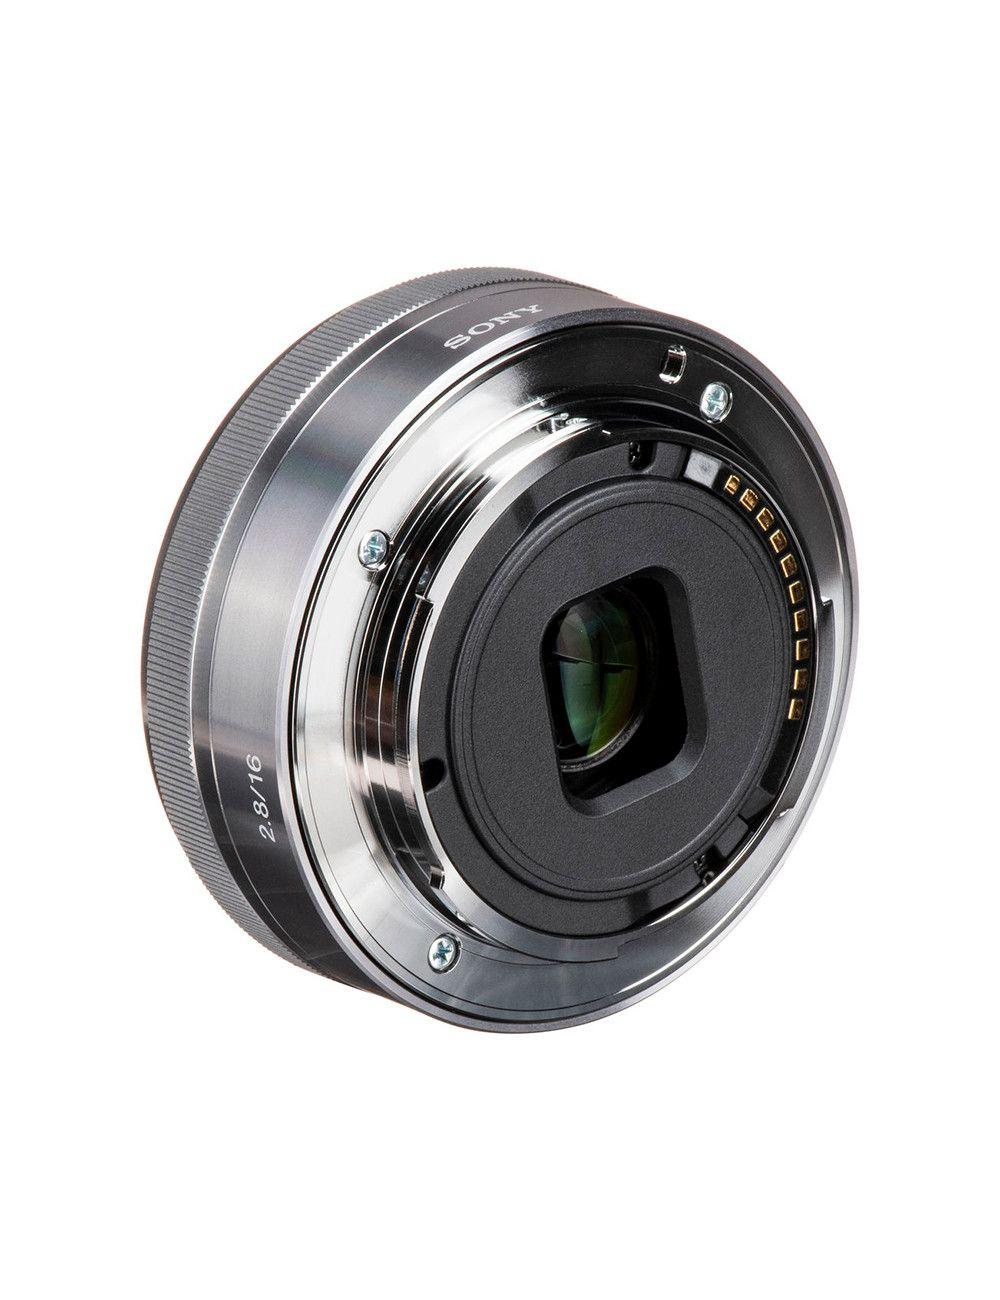 Lowepro S&F Lens Exchange Case 200AW - Bolso para Lentes de hasta 23cms